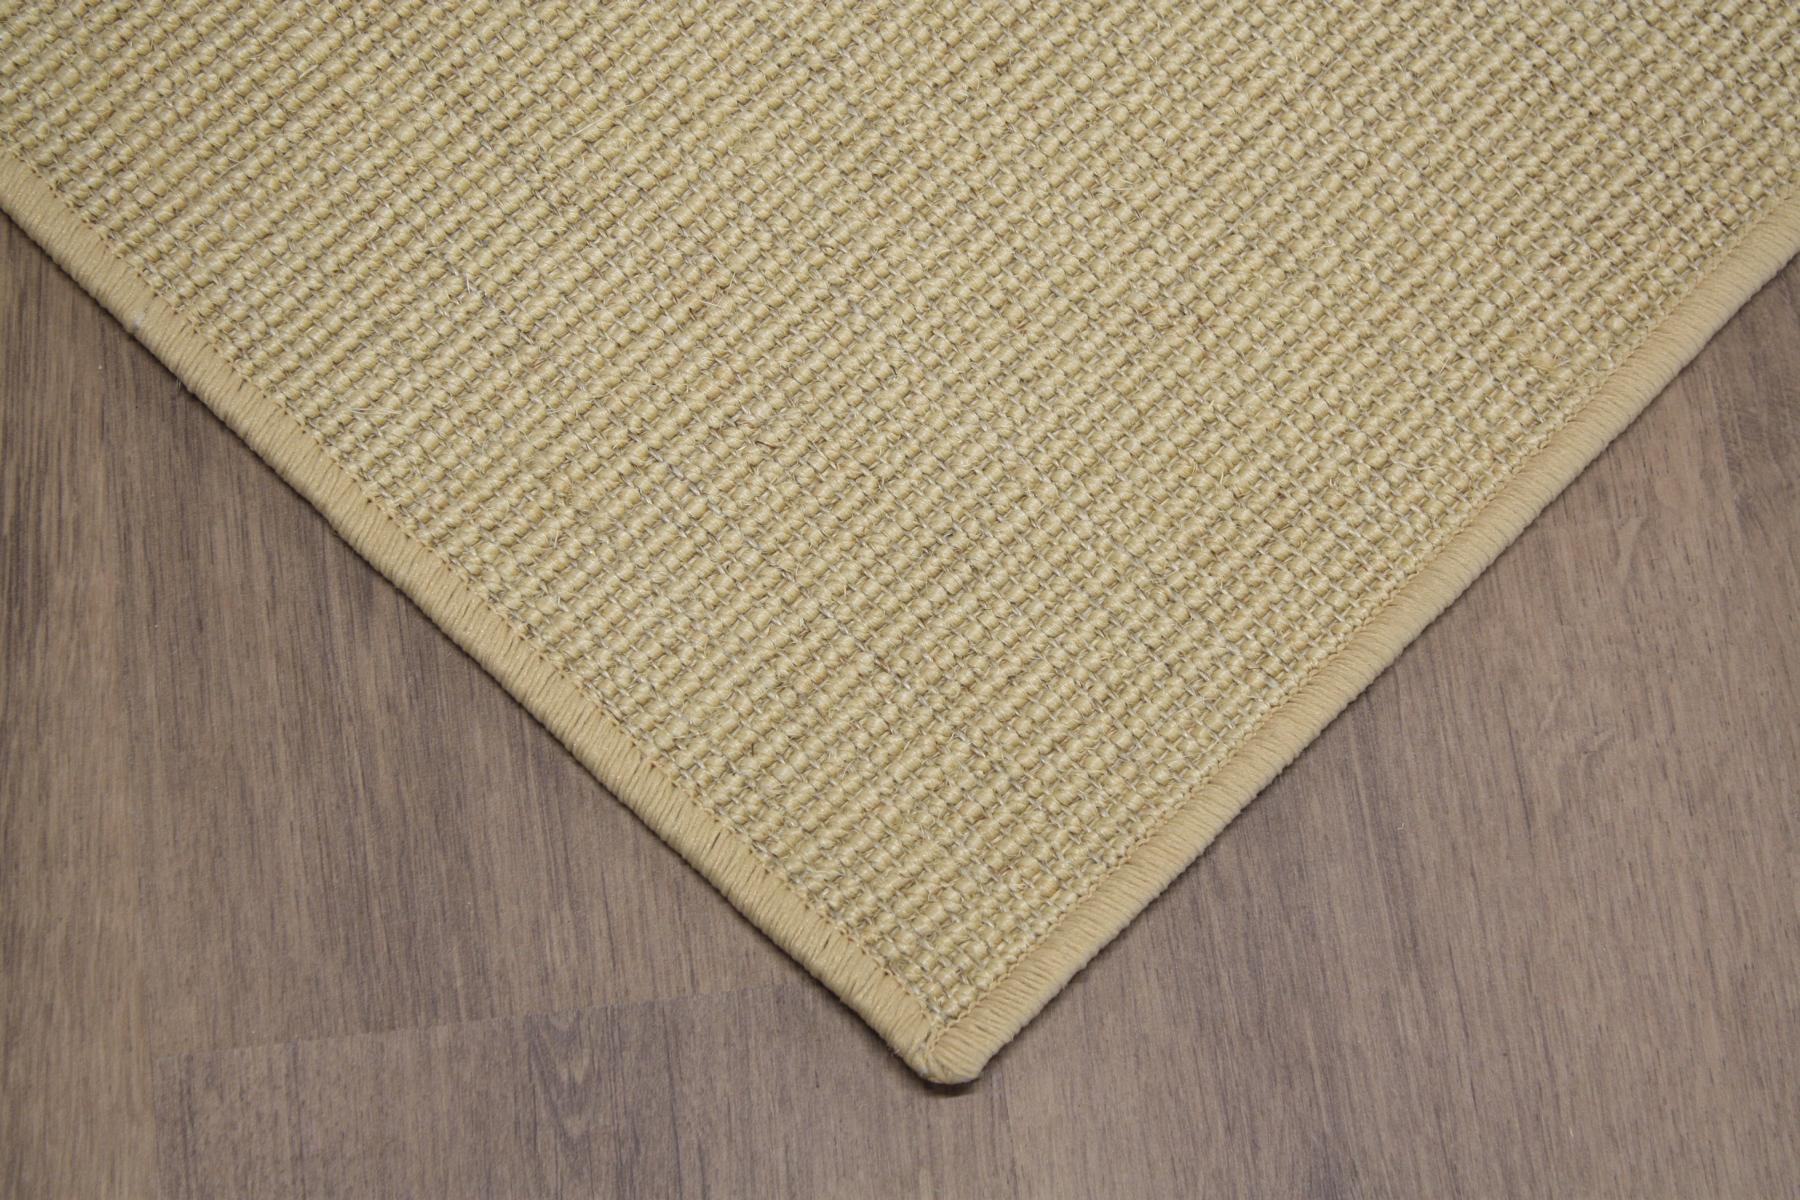 sisal teppich umkettelt reis 200x300cm 100 sisal gekettelt. Black Bedroom Furniture Sets. Home Design Ideas